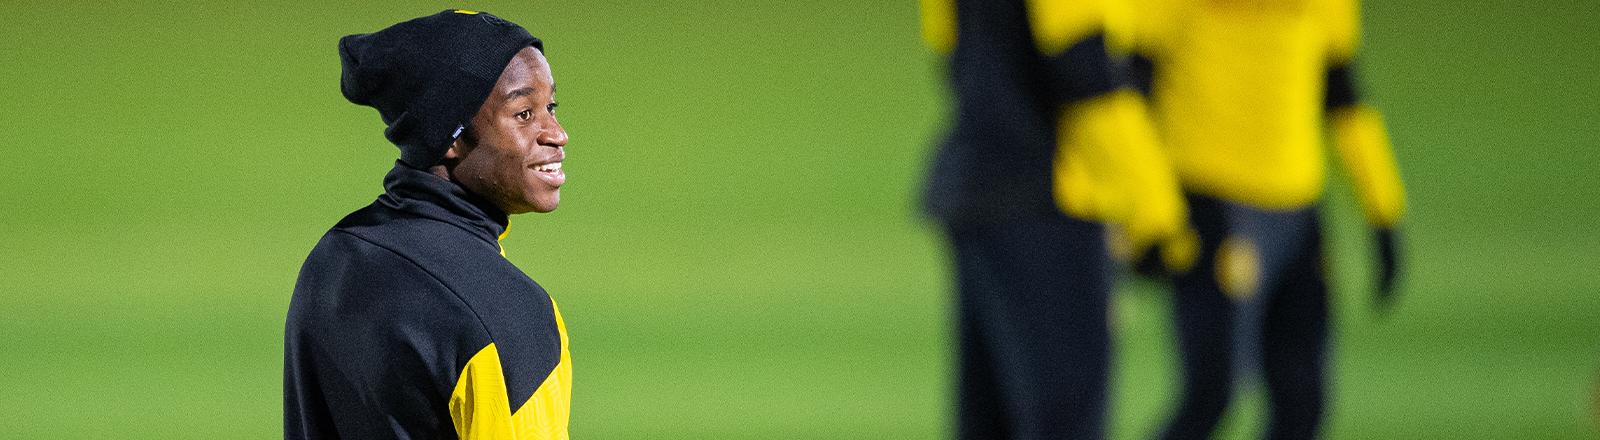 Yousoufa Moukoko beim Abschlusstraining des BVB vor dem Champions League Spiel gegen Brügge